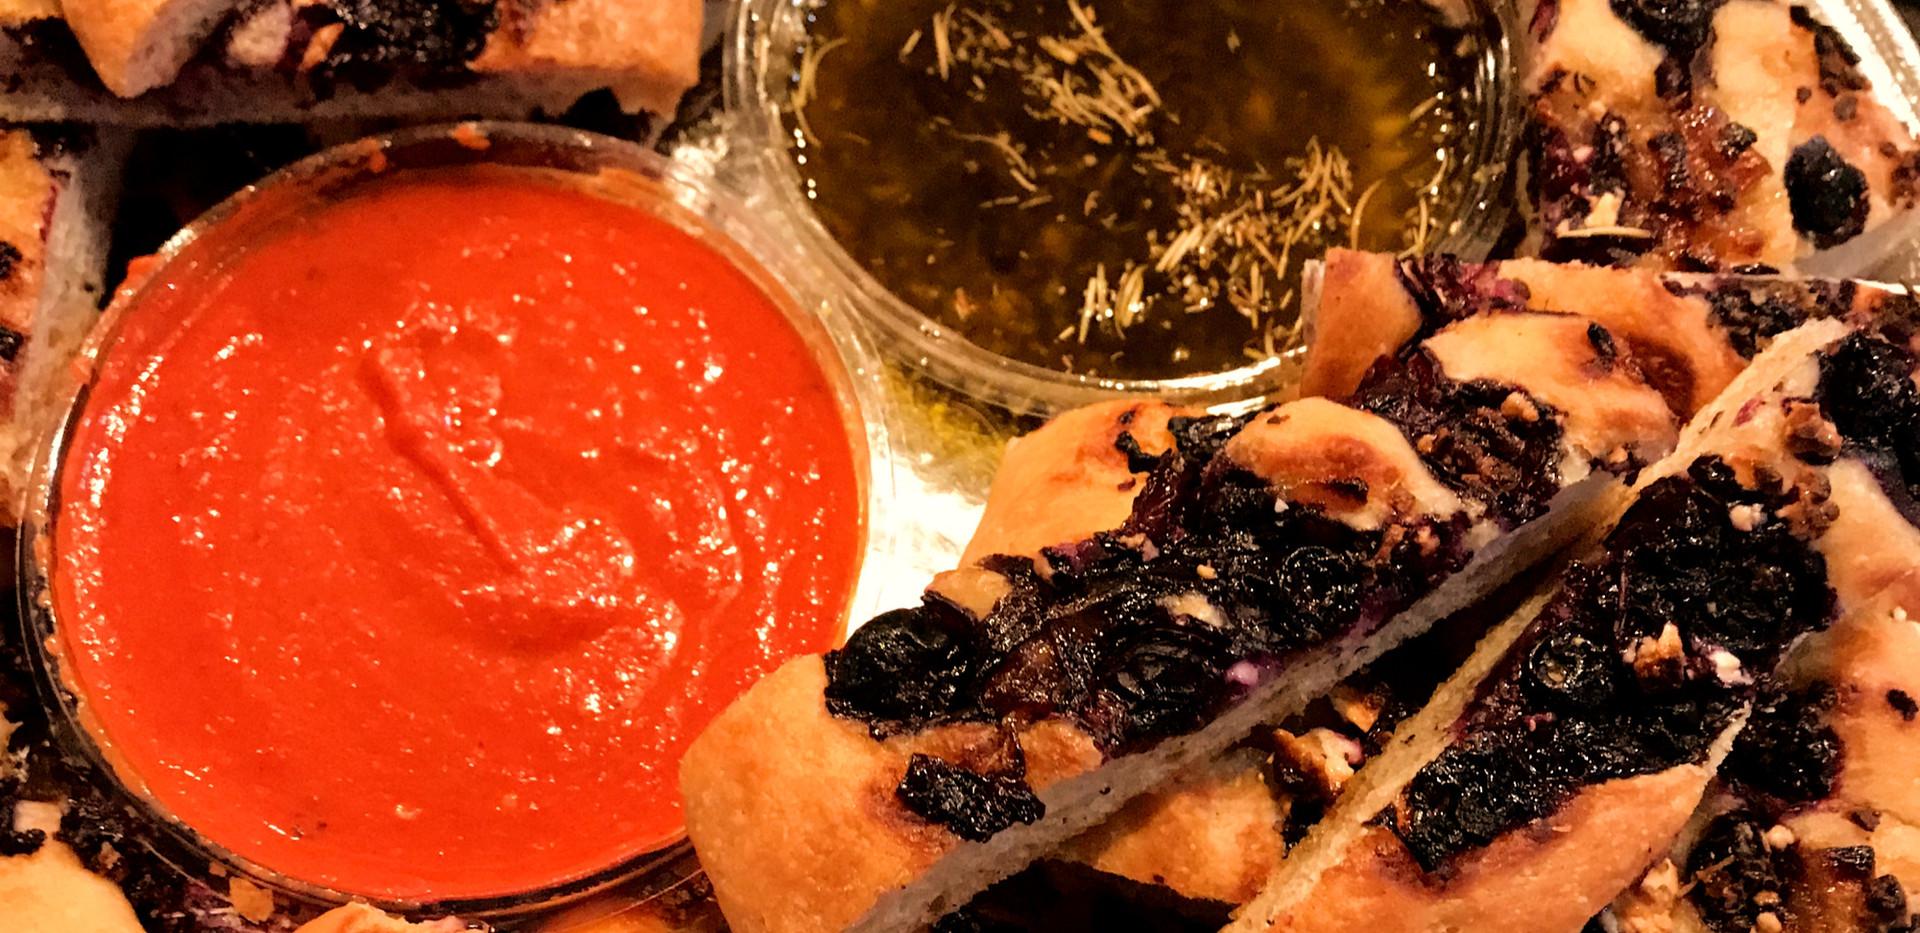 Blueberry Feta and Bourbon Carmelized Onion Focaccia